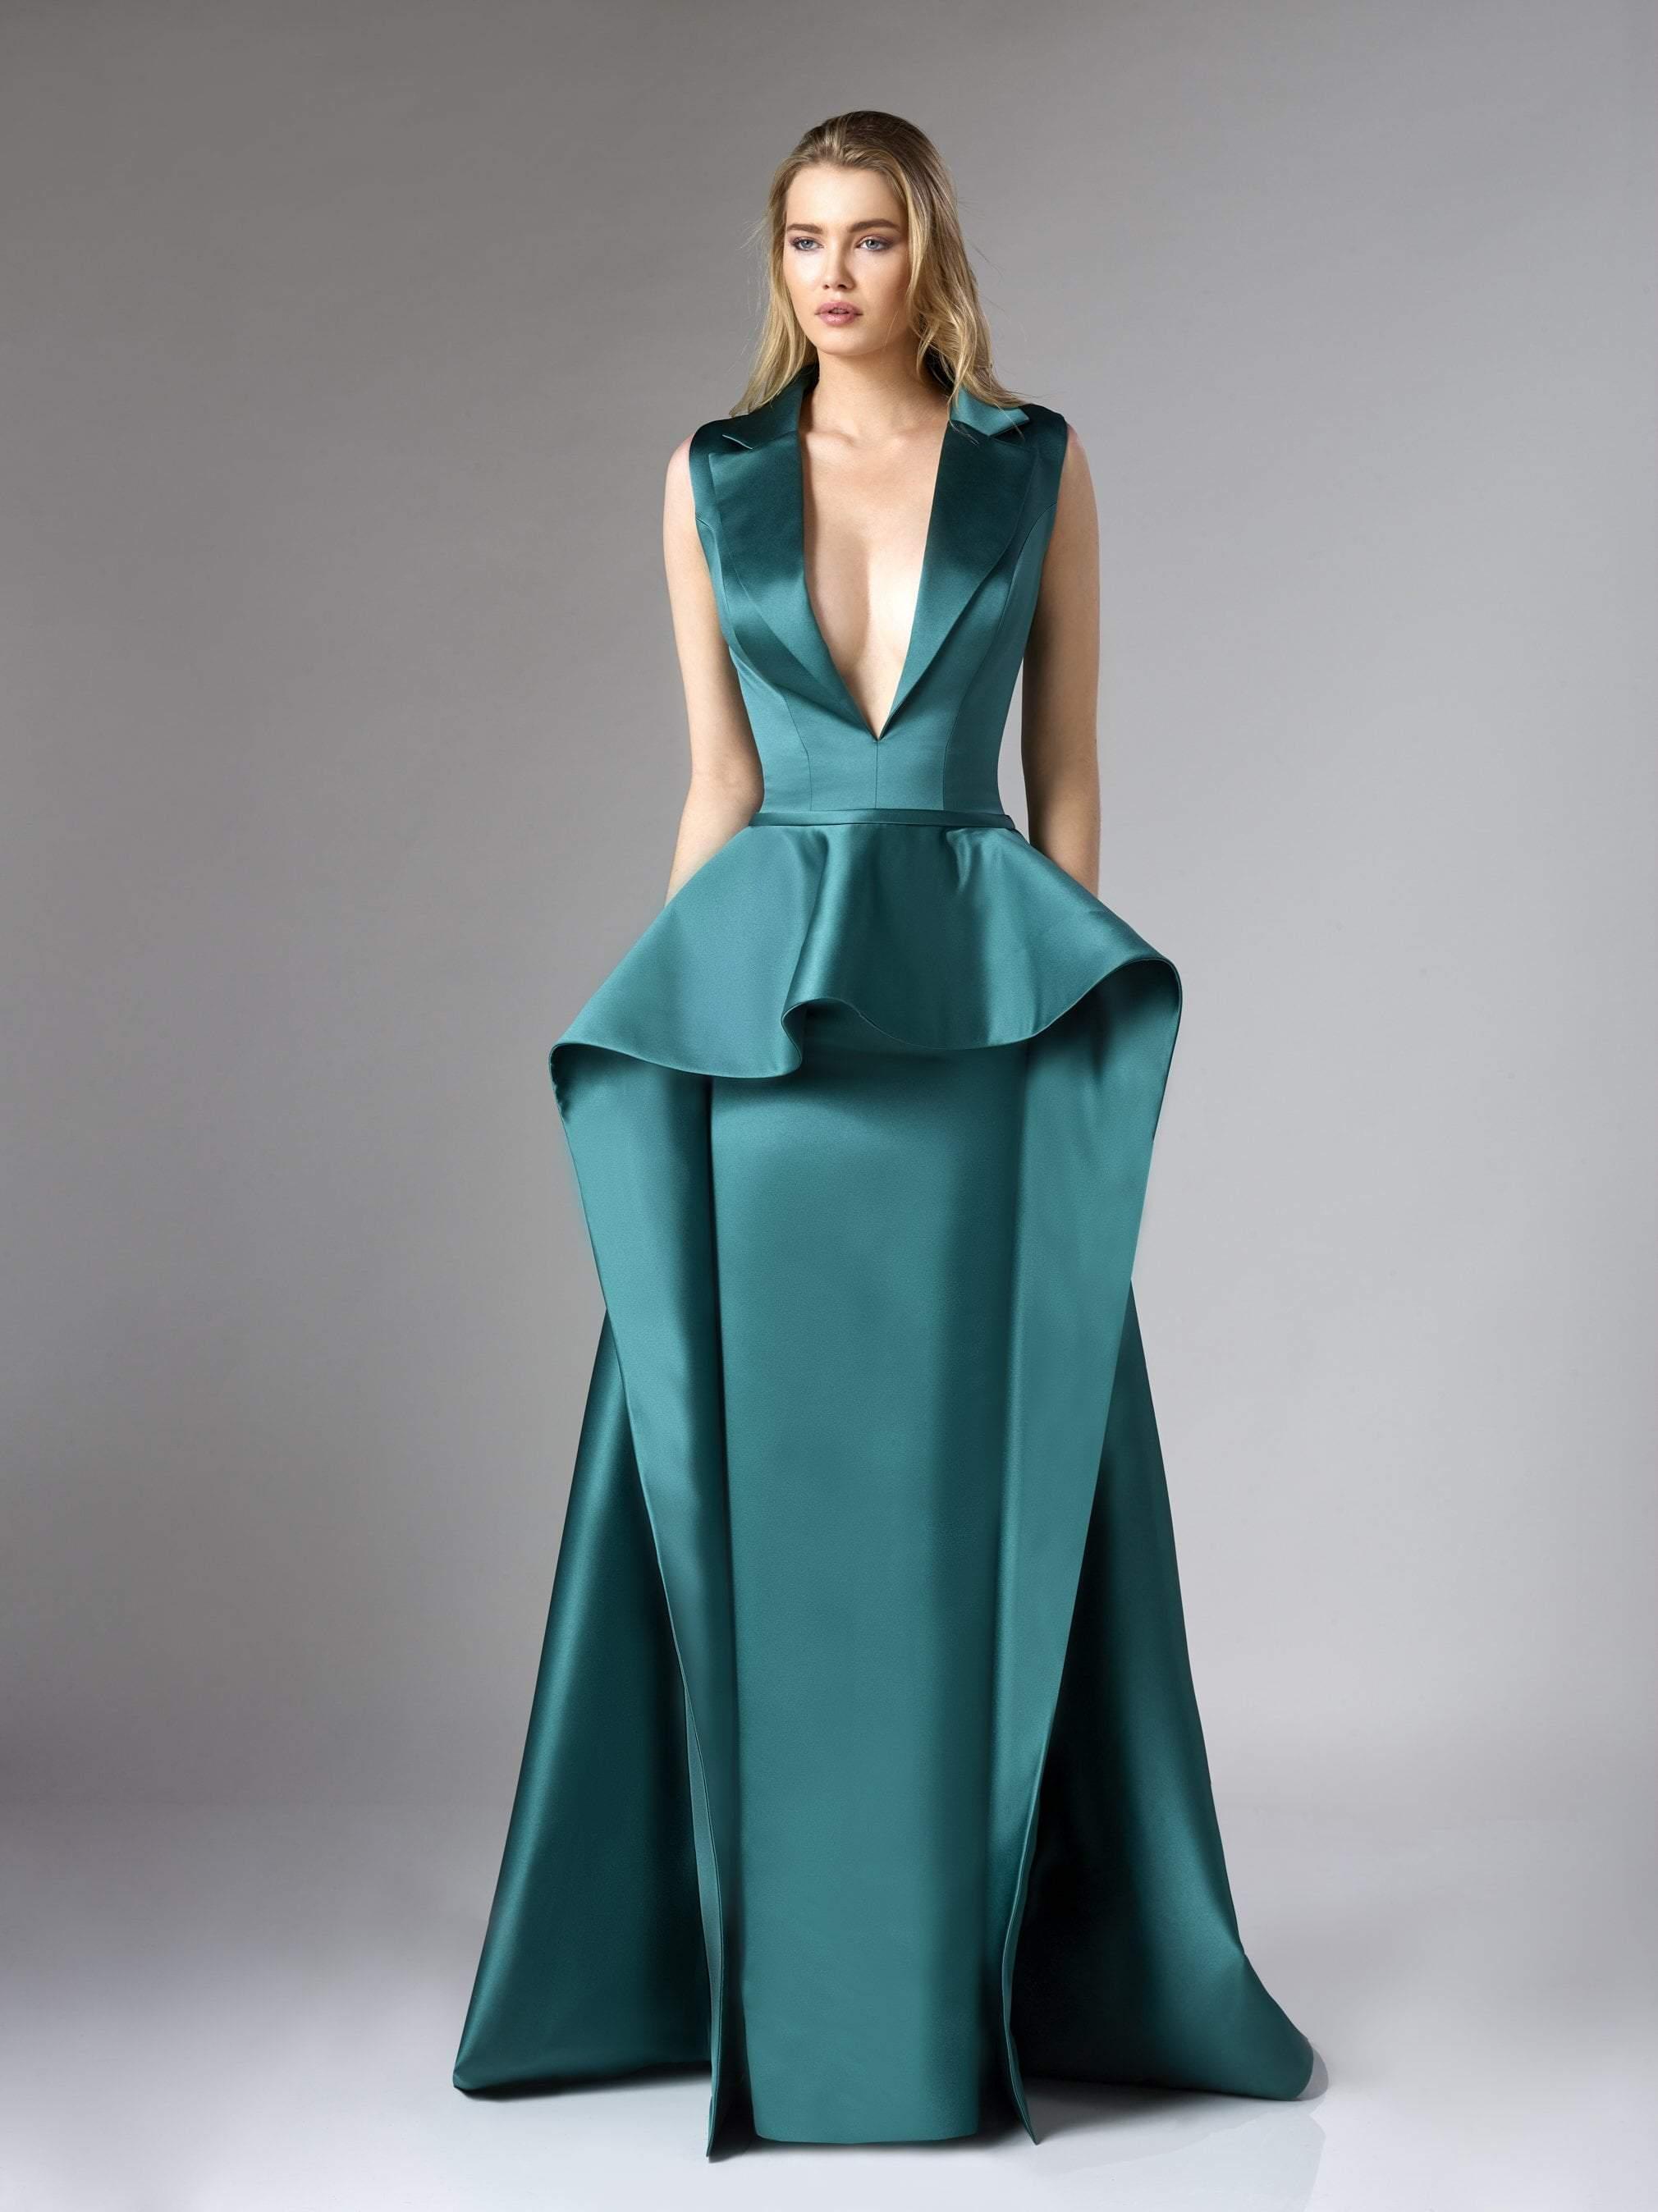 Edward Arsouni Couture - 310 Deep V-neck Satin Dress in Emerald Green